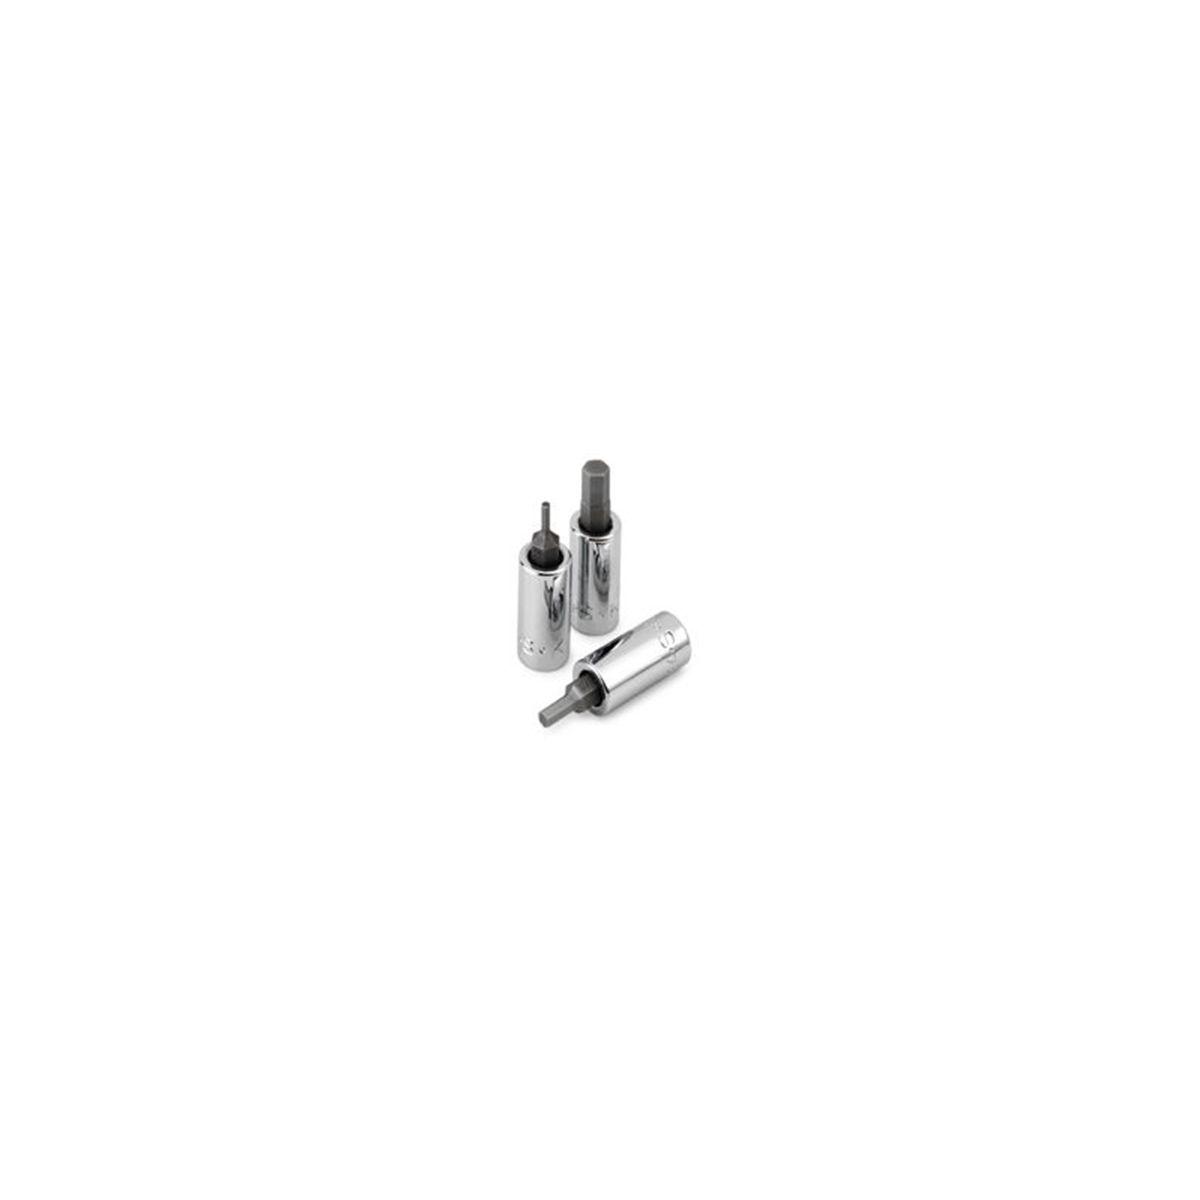 1 4 Inch Drive Fractional SAE Hex Bit Socket 9 64